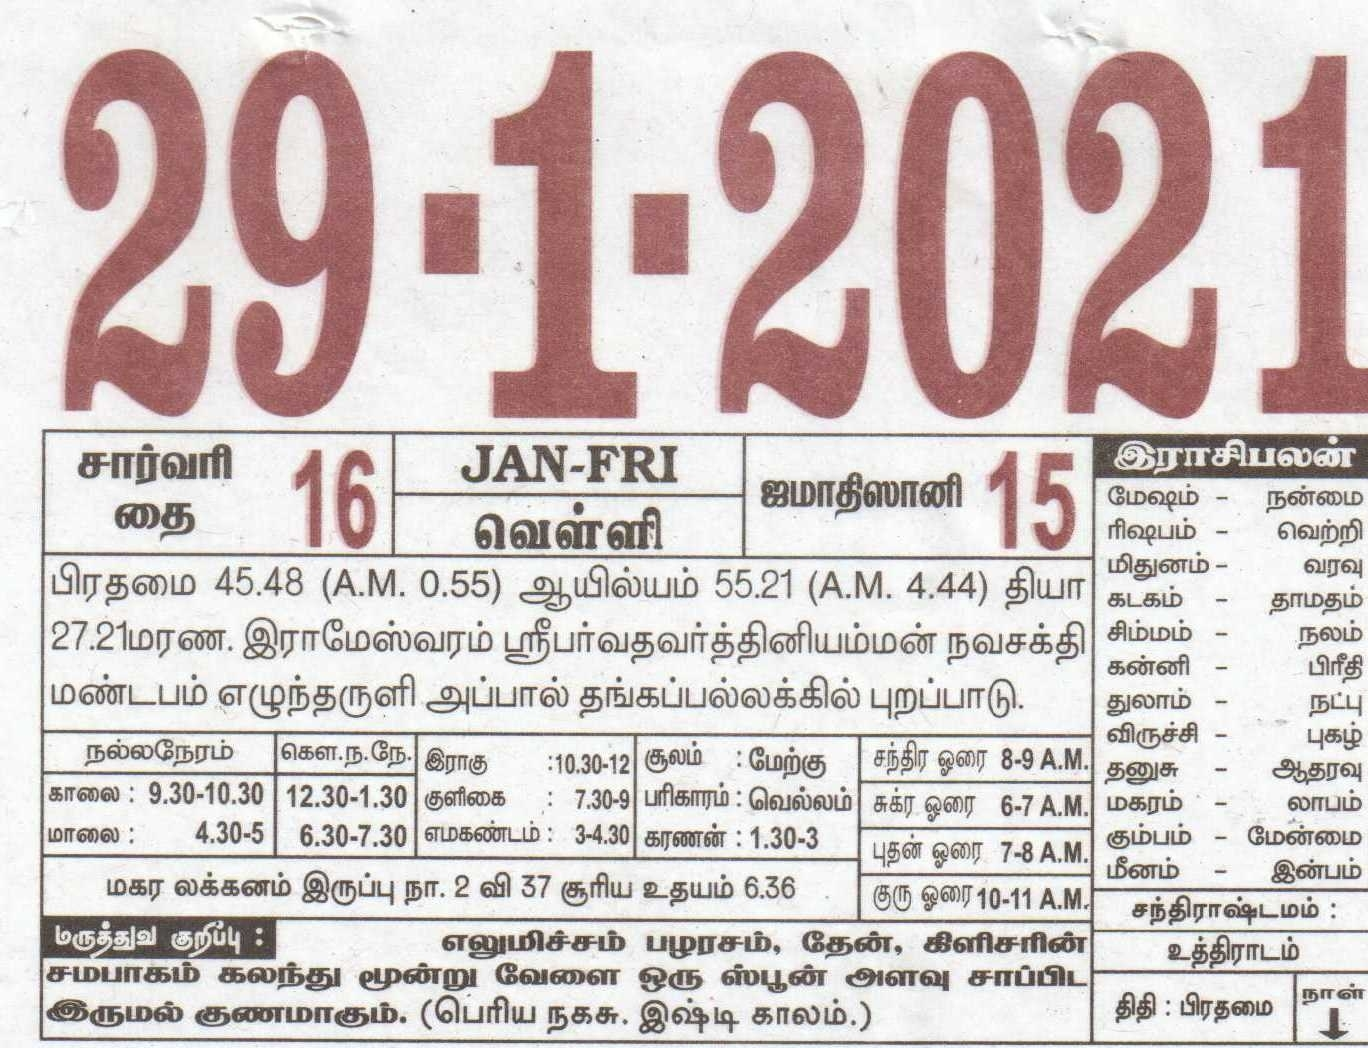 29-01-2021 Daily Calendar | Date 29 , January Daily Tear Off Calendar | Daily Panchangam Rasi Palan August 2021 Tamil Daily Calendar